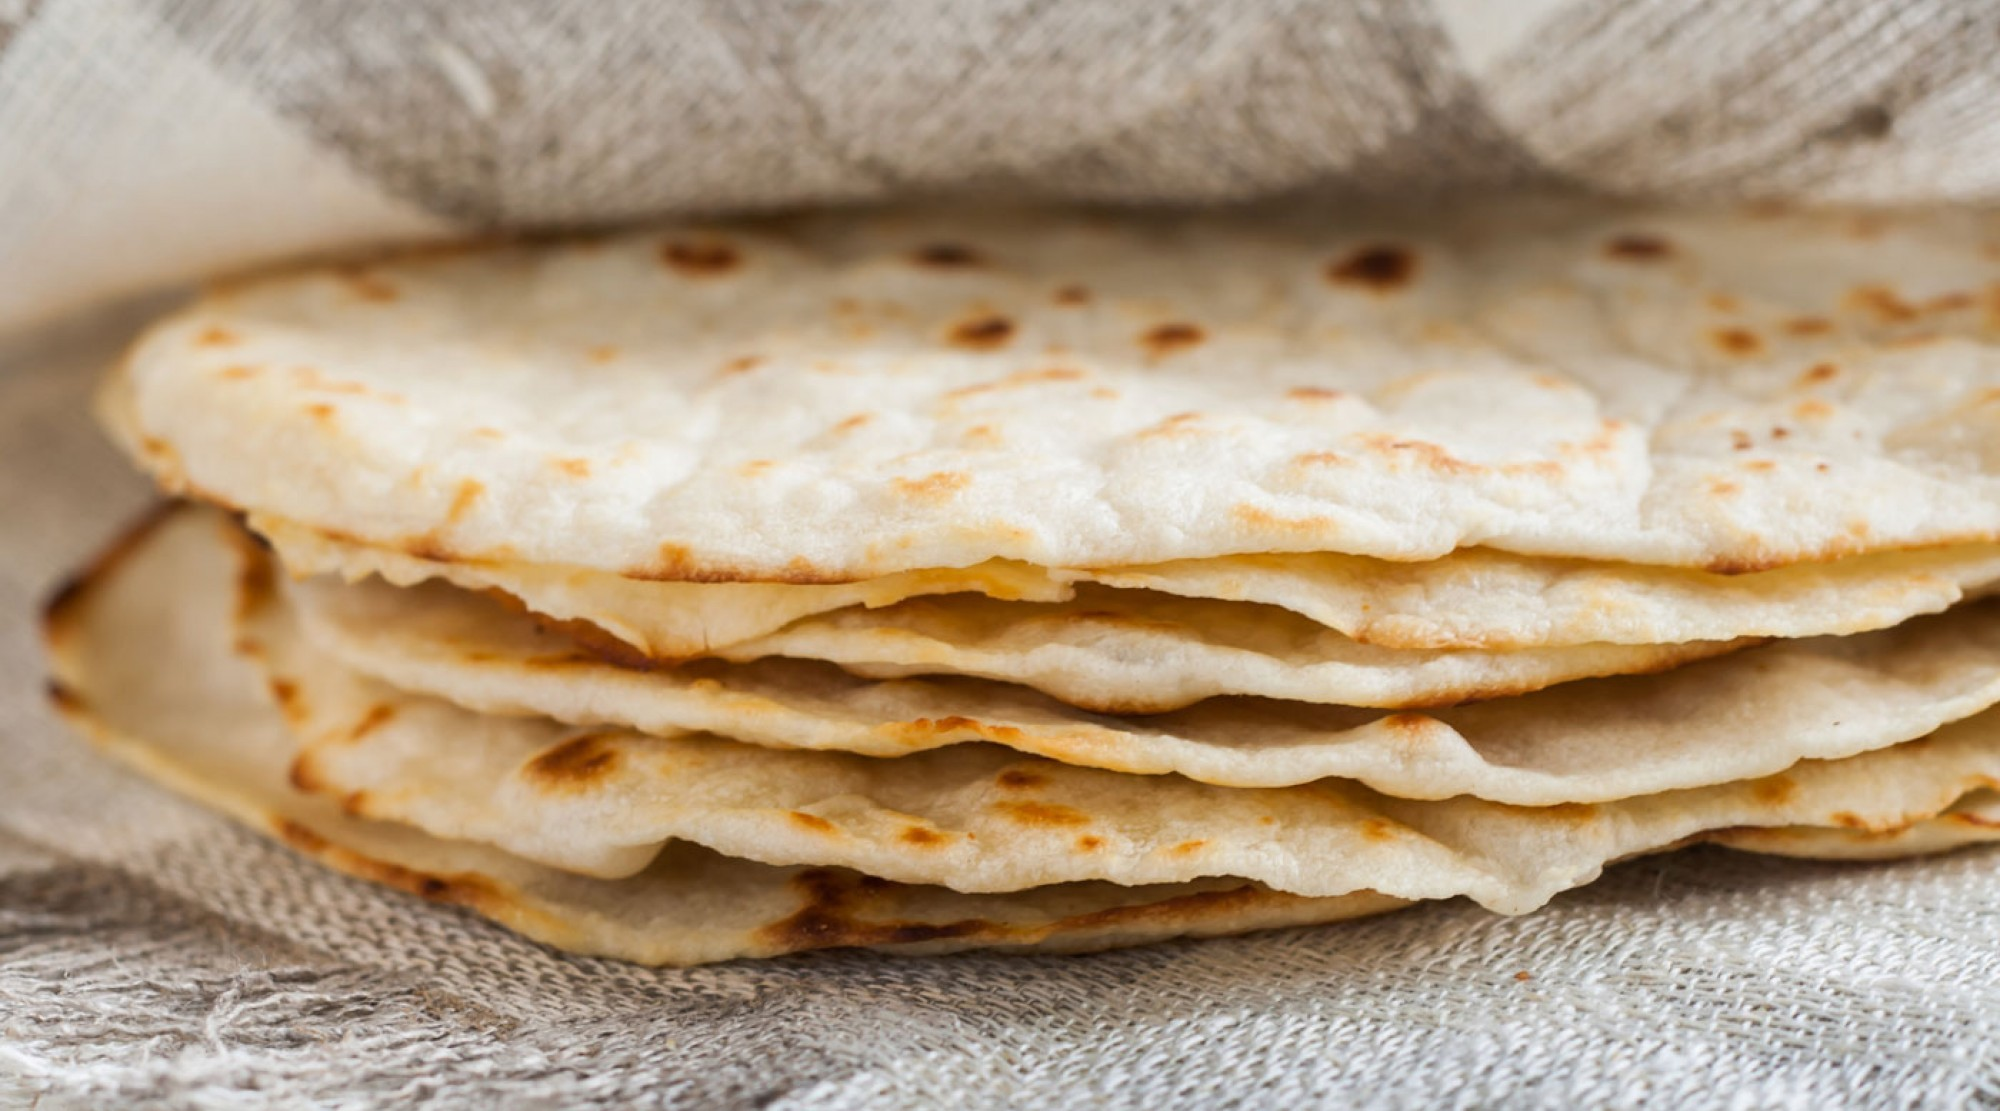 flour-torillas_UserGI15633745-iStock-GettyImagesPlus-579251574-LEDE